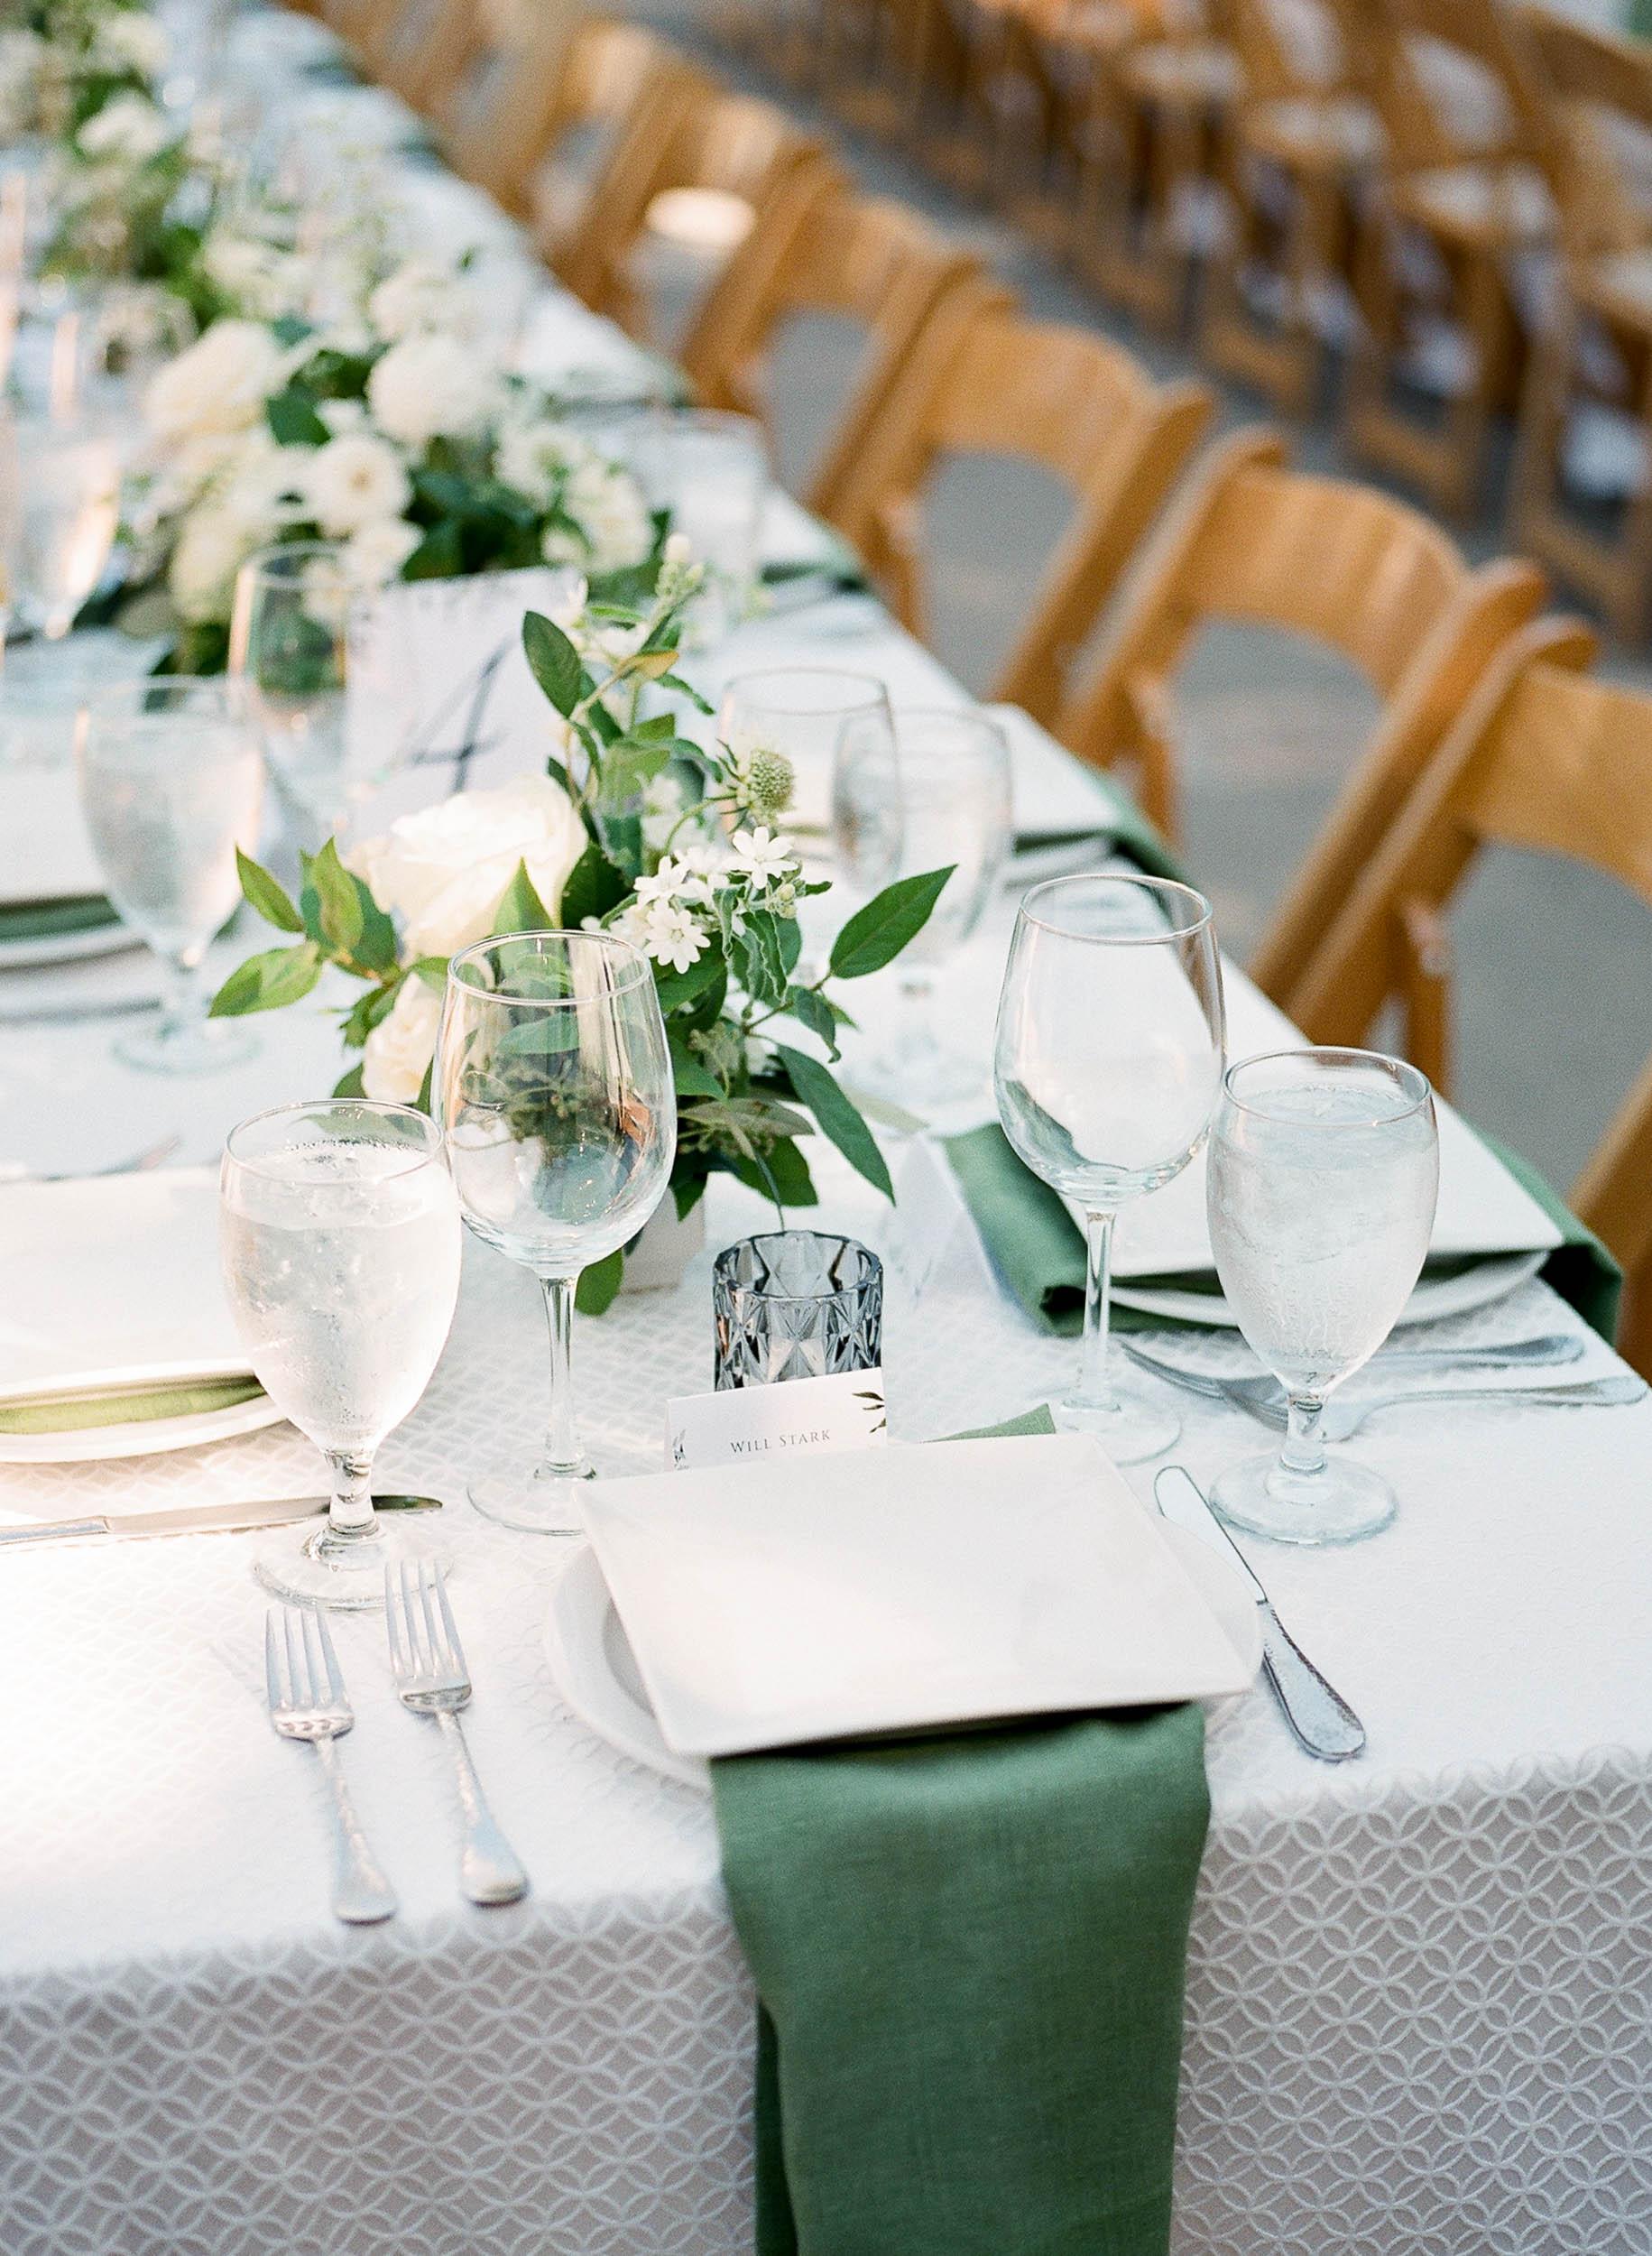 073_072118_D+K_Holman Ranch Wedding_Buena Lane Photography_00005424_34.jpg